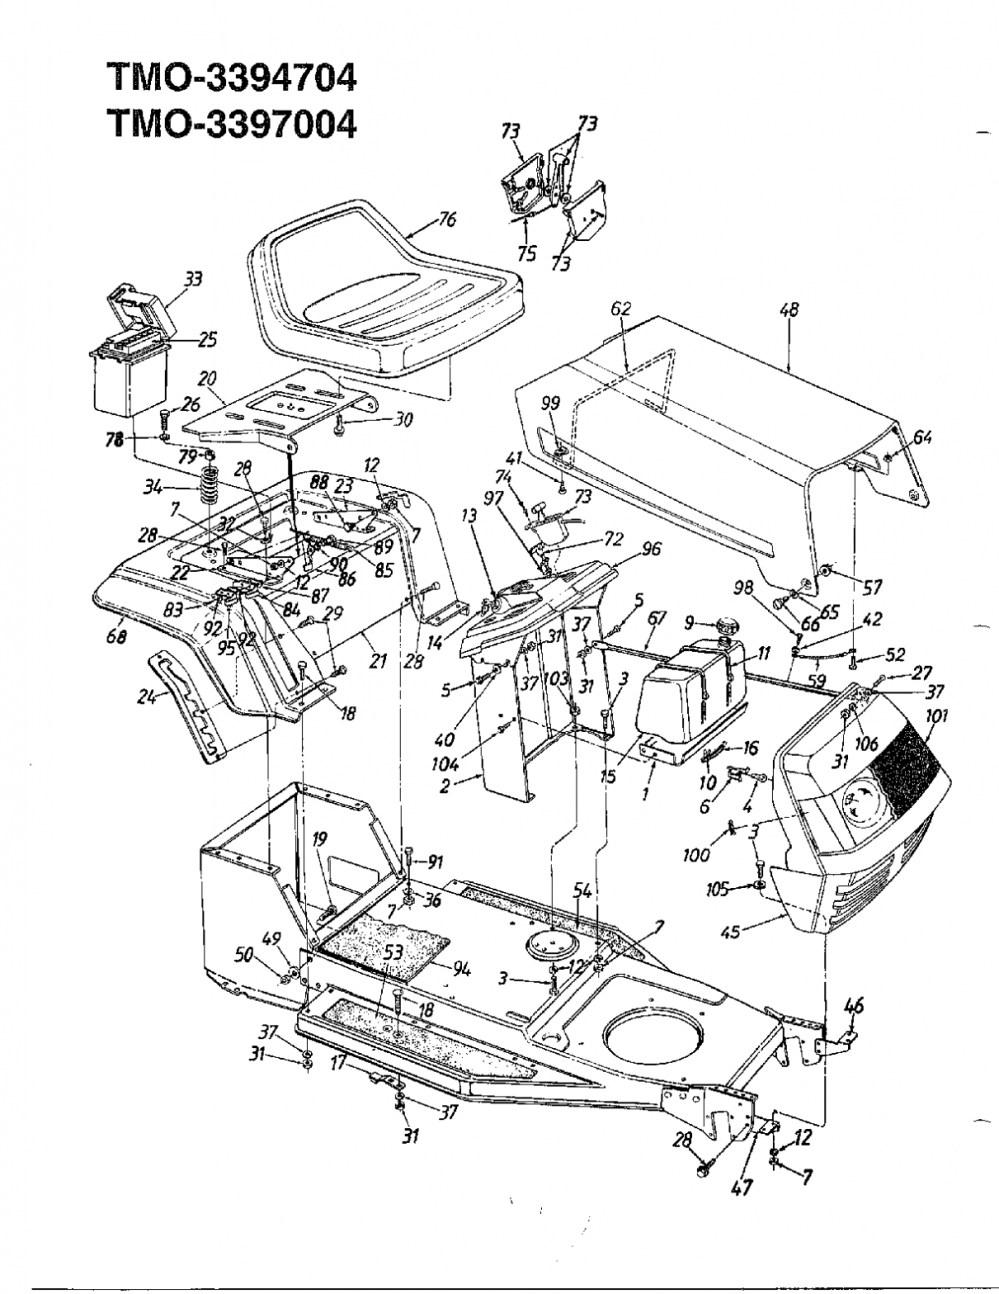 medium resolution of 1211x1568 murry lawn mower parts diagram mtd lawnflite wiring diagram riding lawn mower drawing